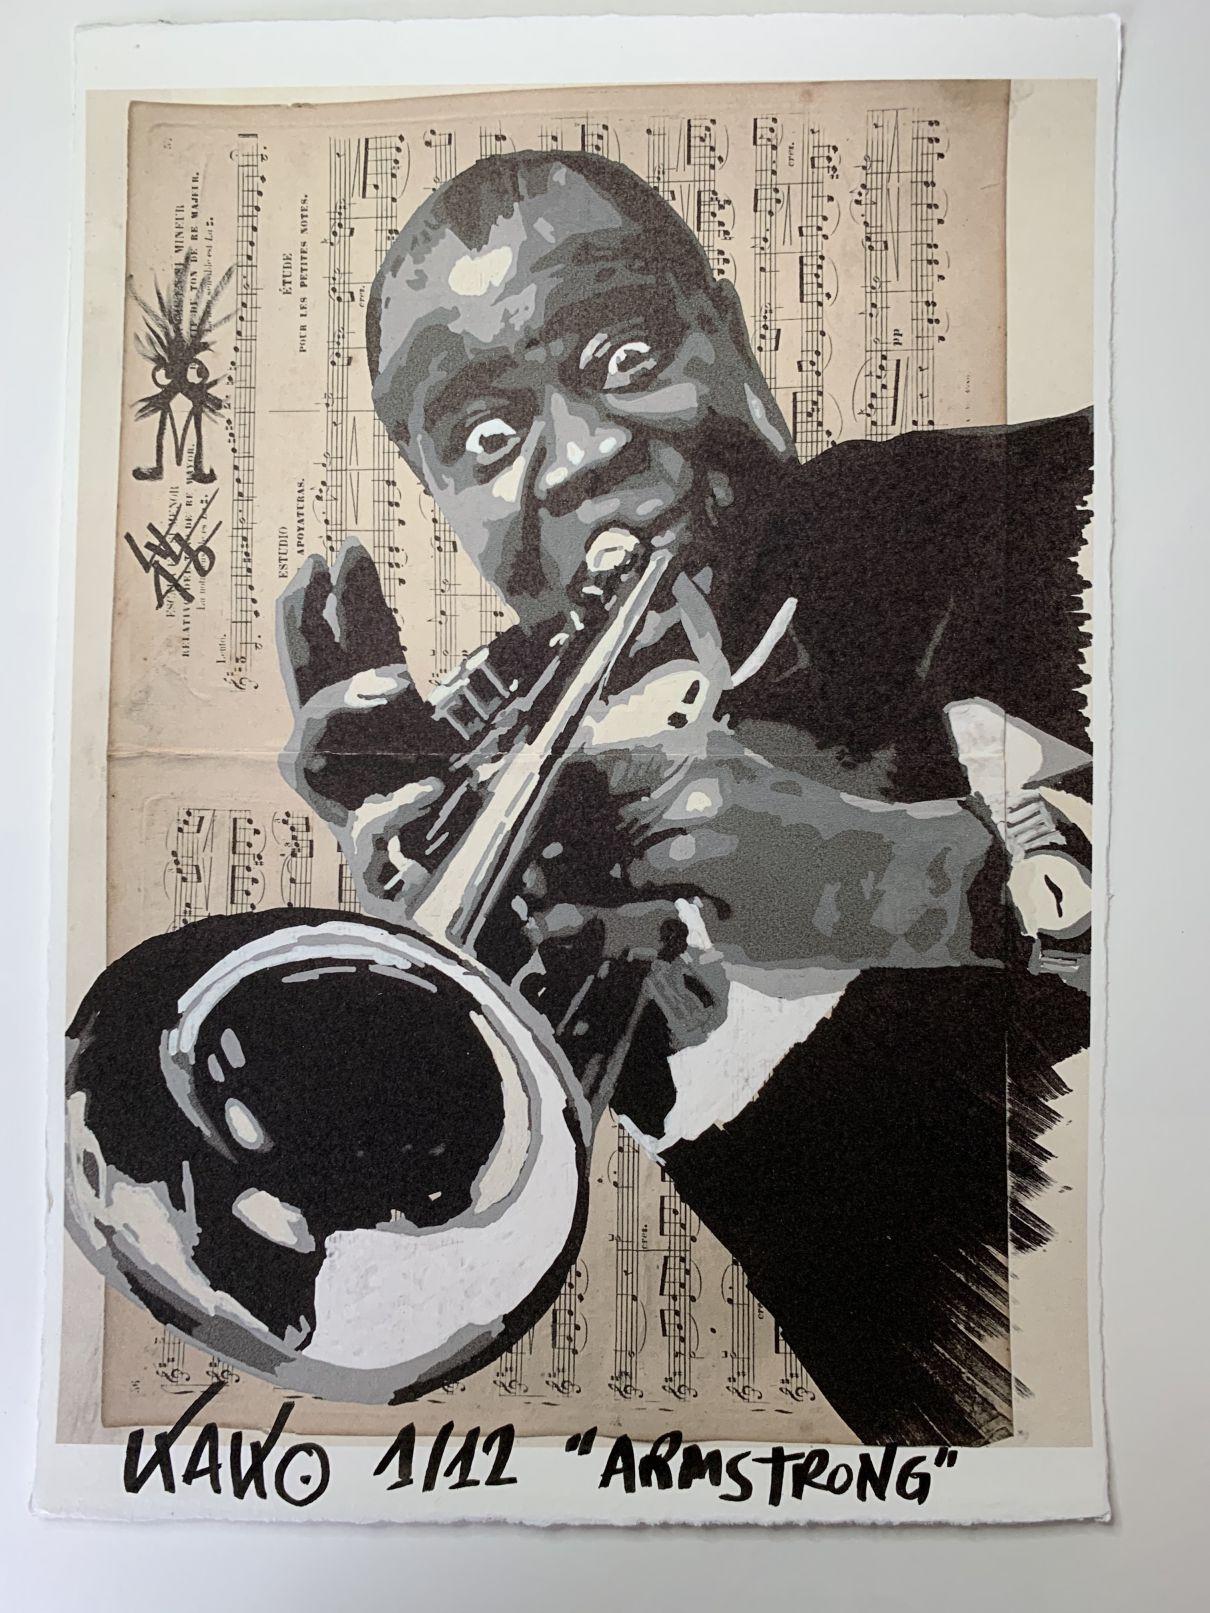 Louis Armstrong (2020) - Kako Street Art